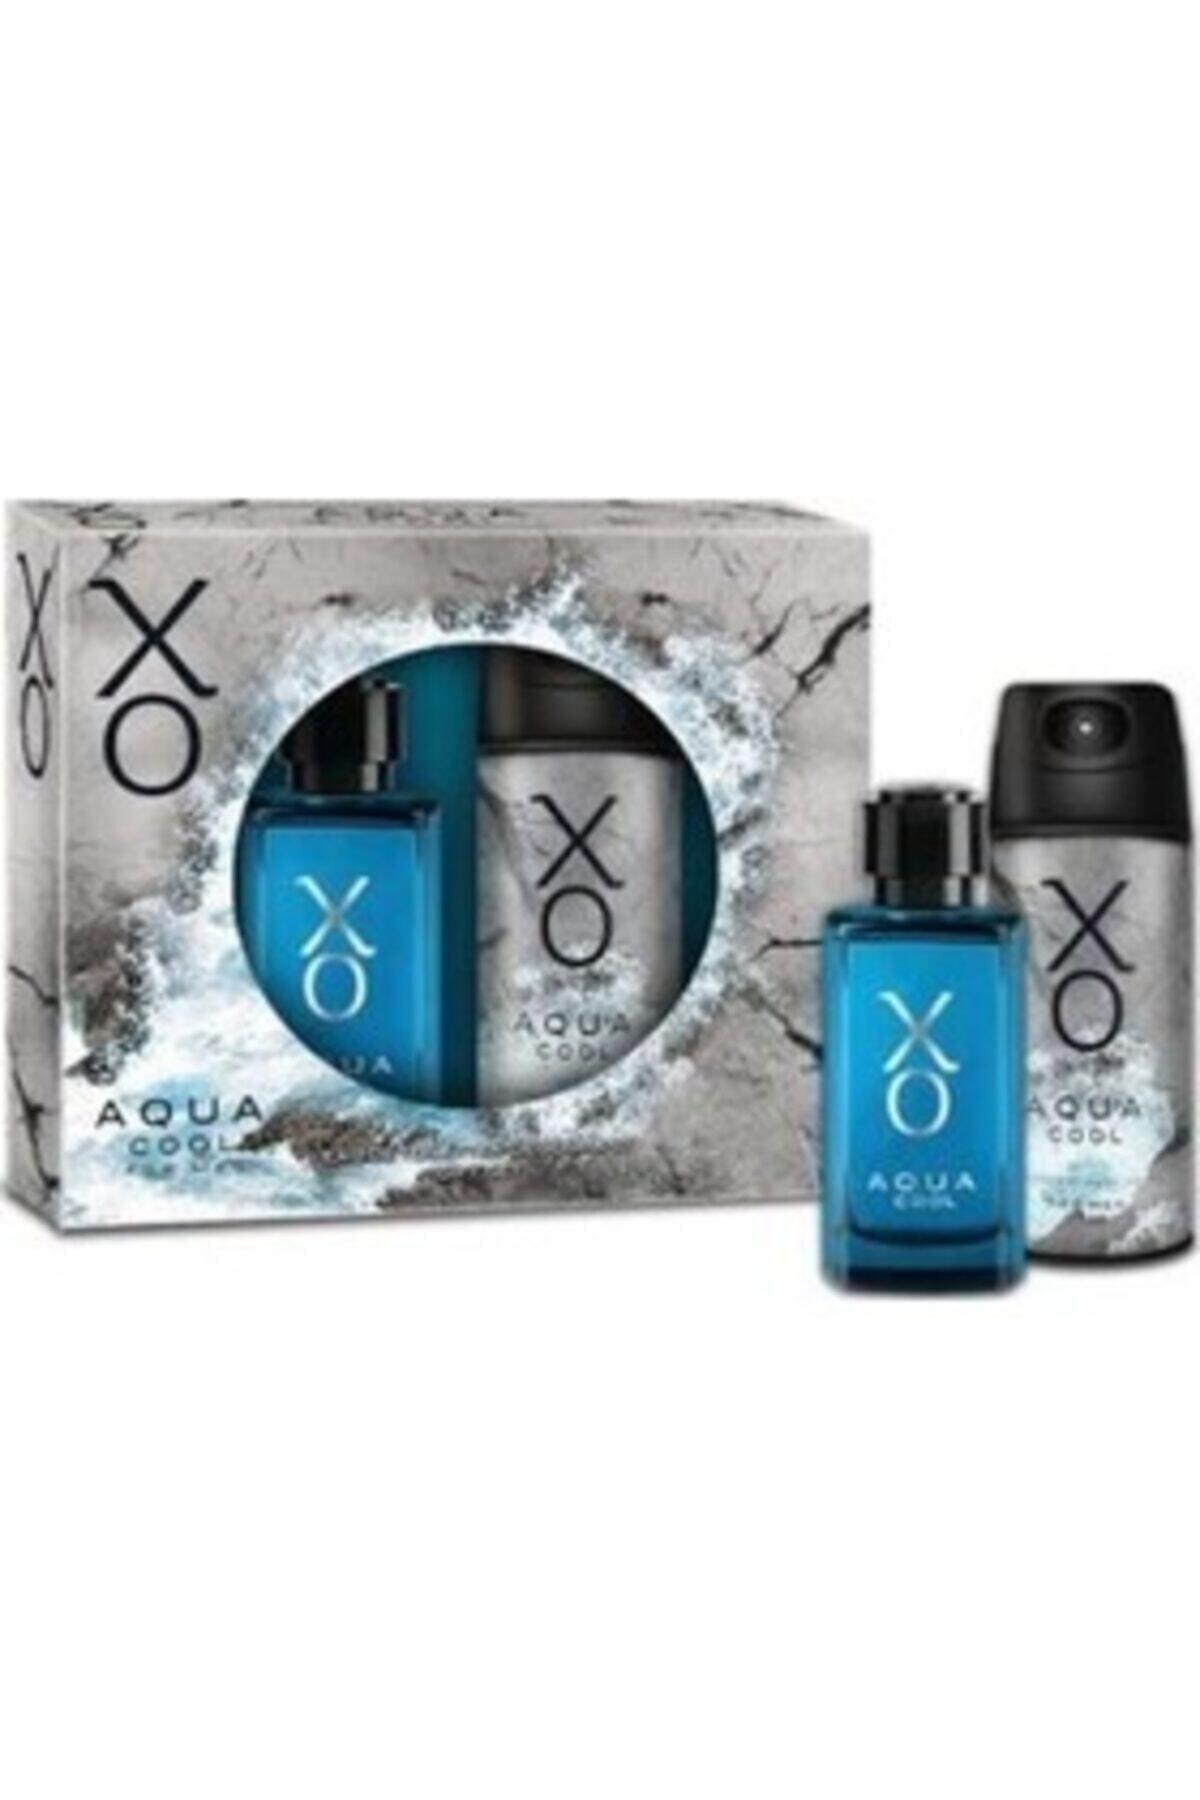 Xo Orıjınal Aqua Cool Erkek Parfüm Seti 100 Ml Edt + 125 Ml Deodorant Ikili Set 1